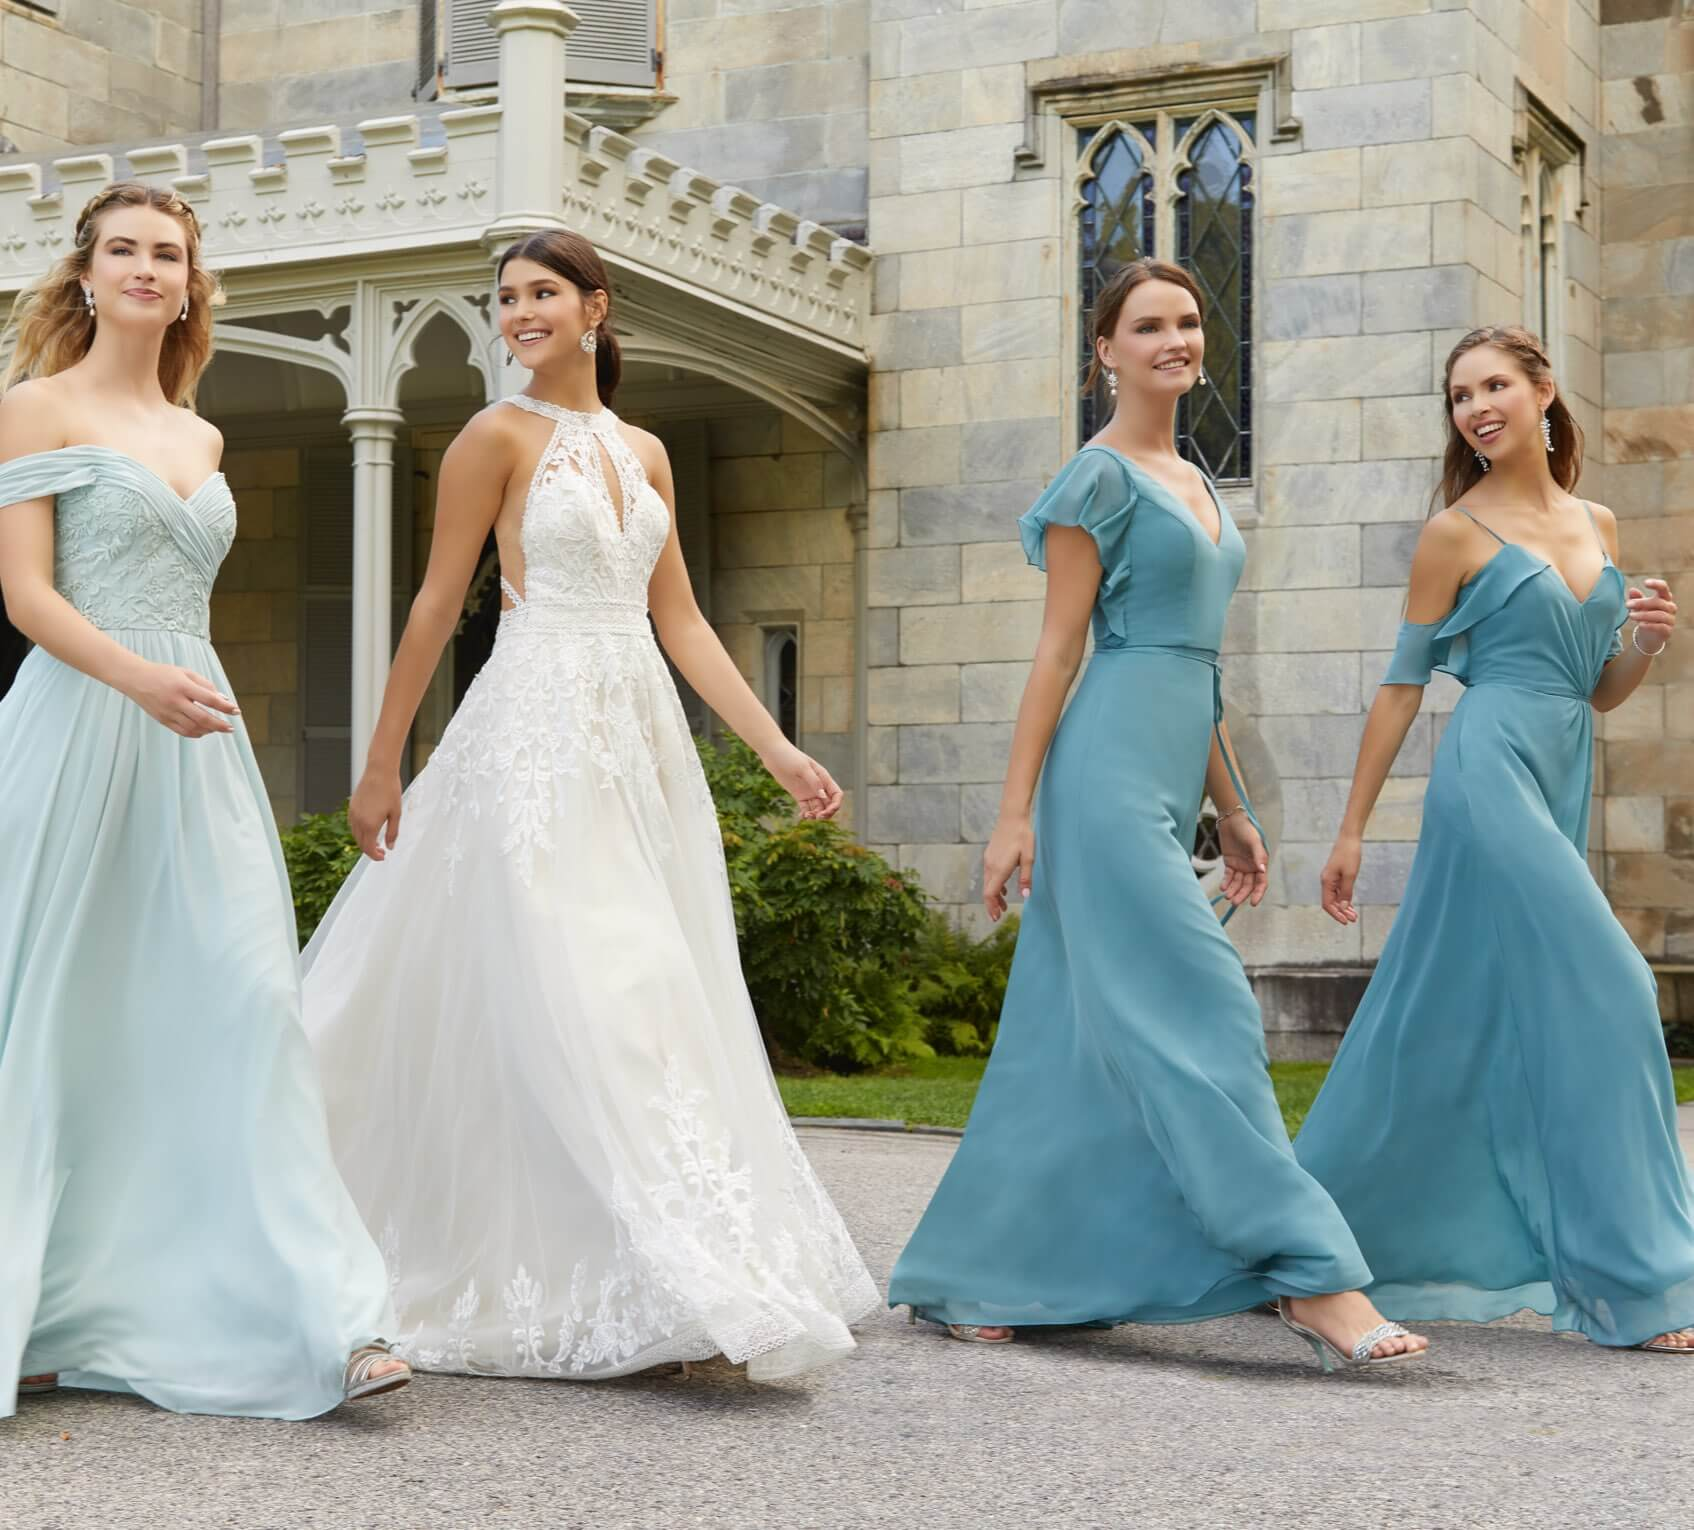 Natalie S Bridal By Blue Bloom Bridal Shop In Lawrenceville Ga Prom Bridesmaid Wedding Dresses,Summer Floral Dresses For Weddings